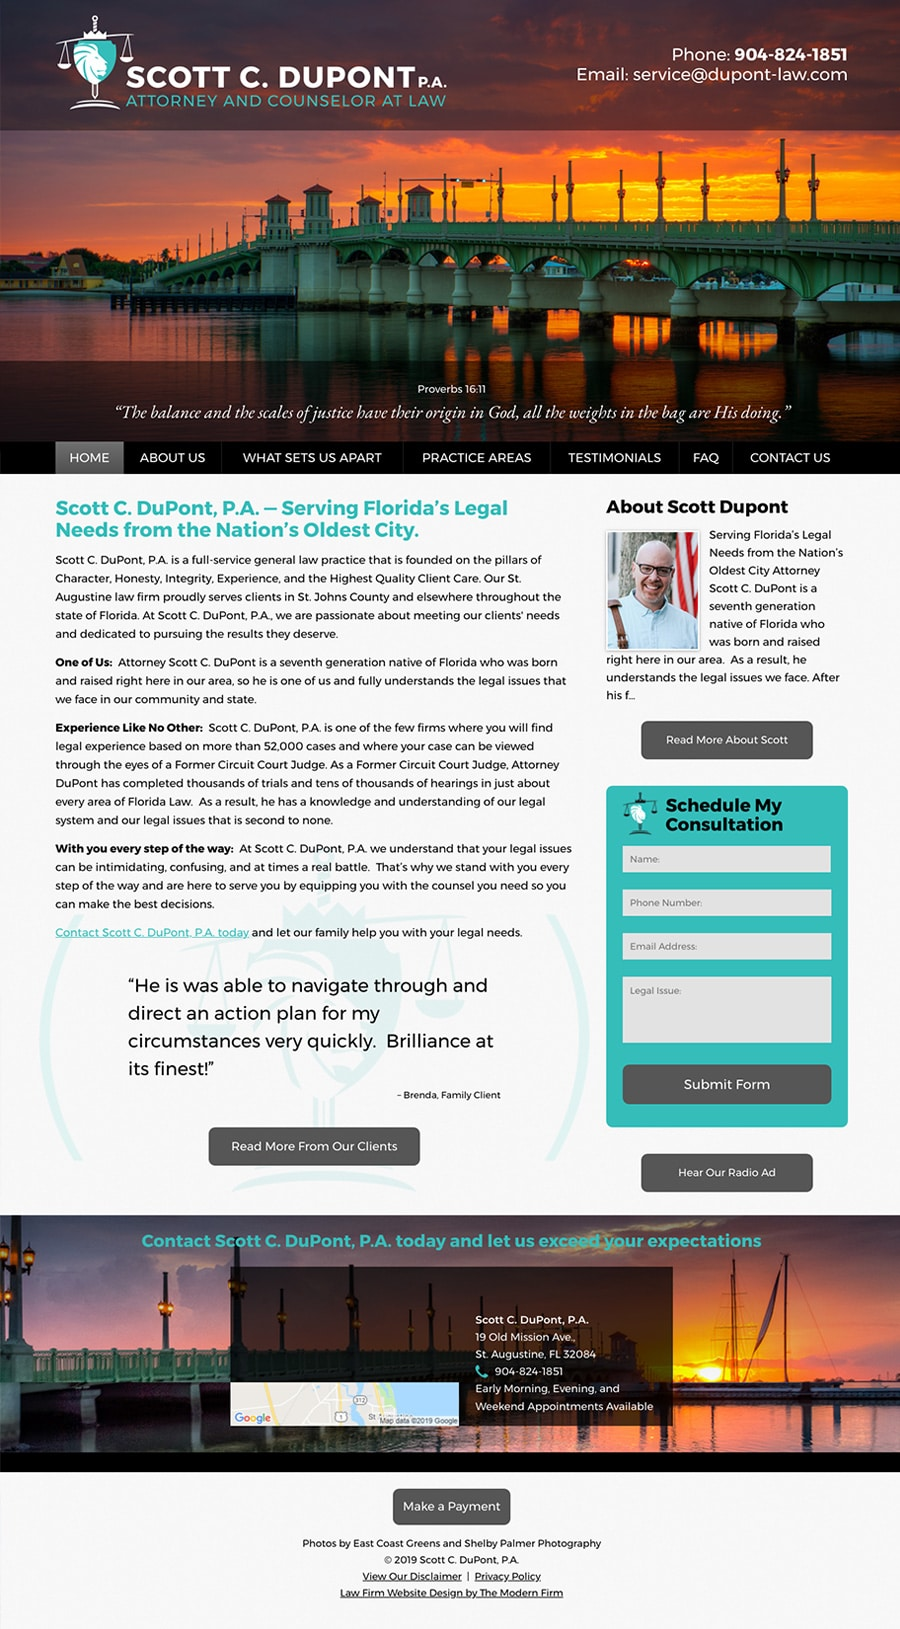 Law Firm Website Design for Scott C. DuPont, P.A.